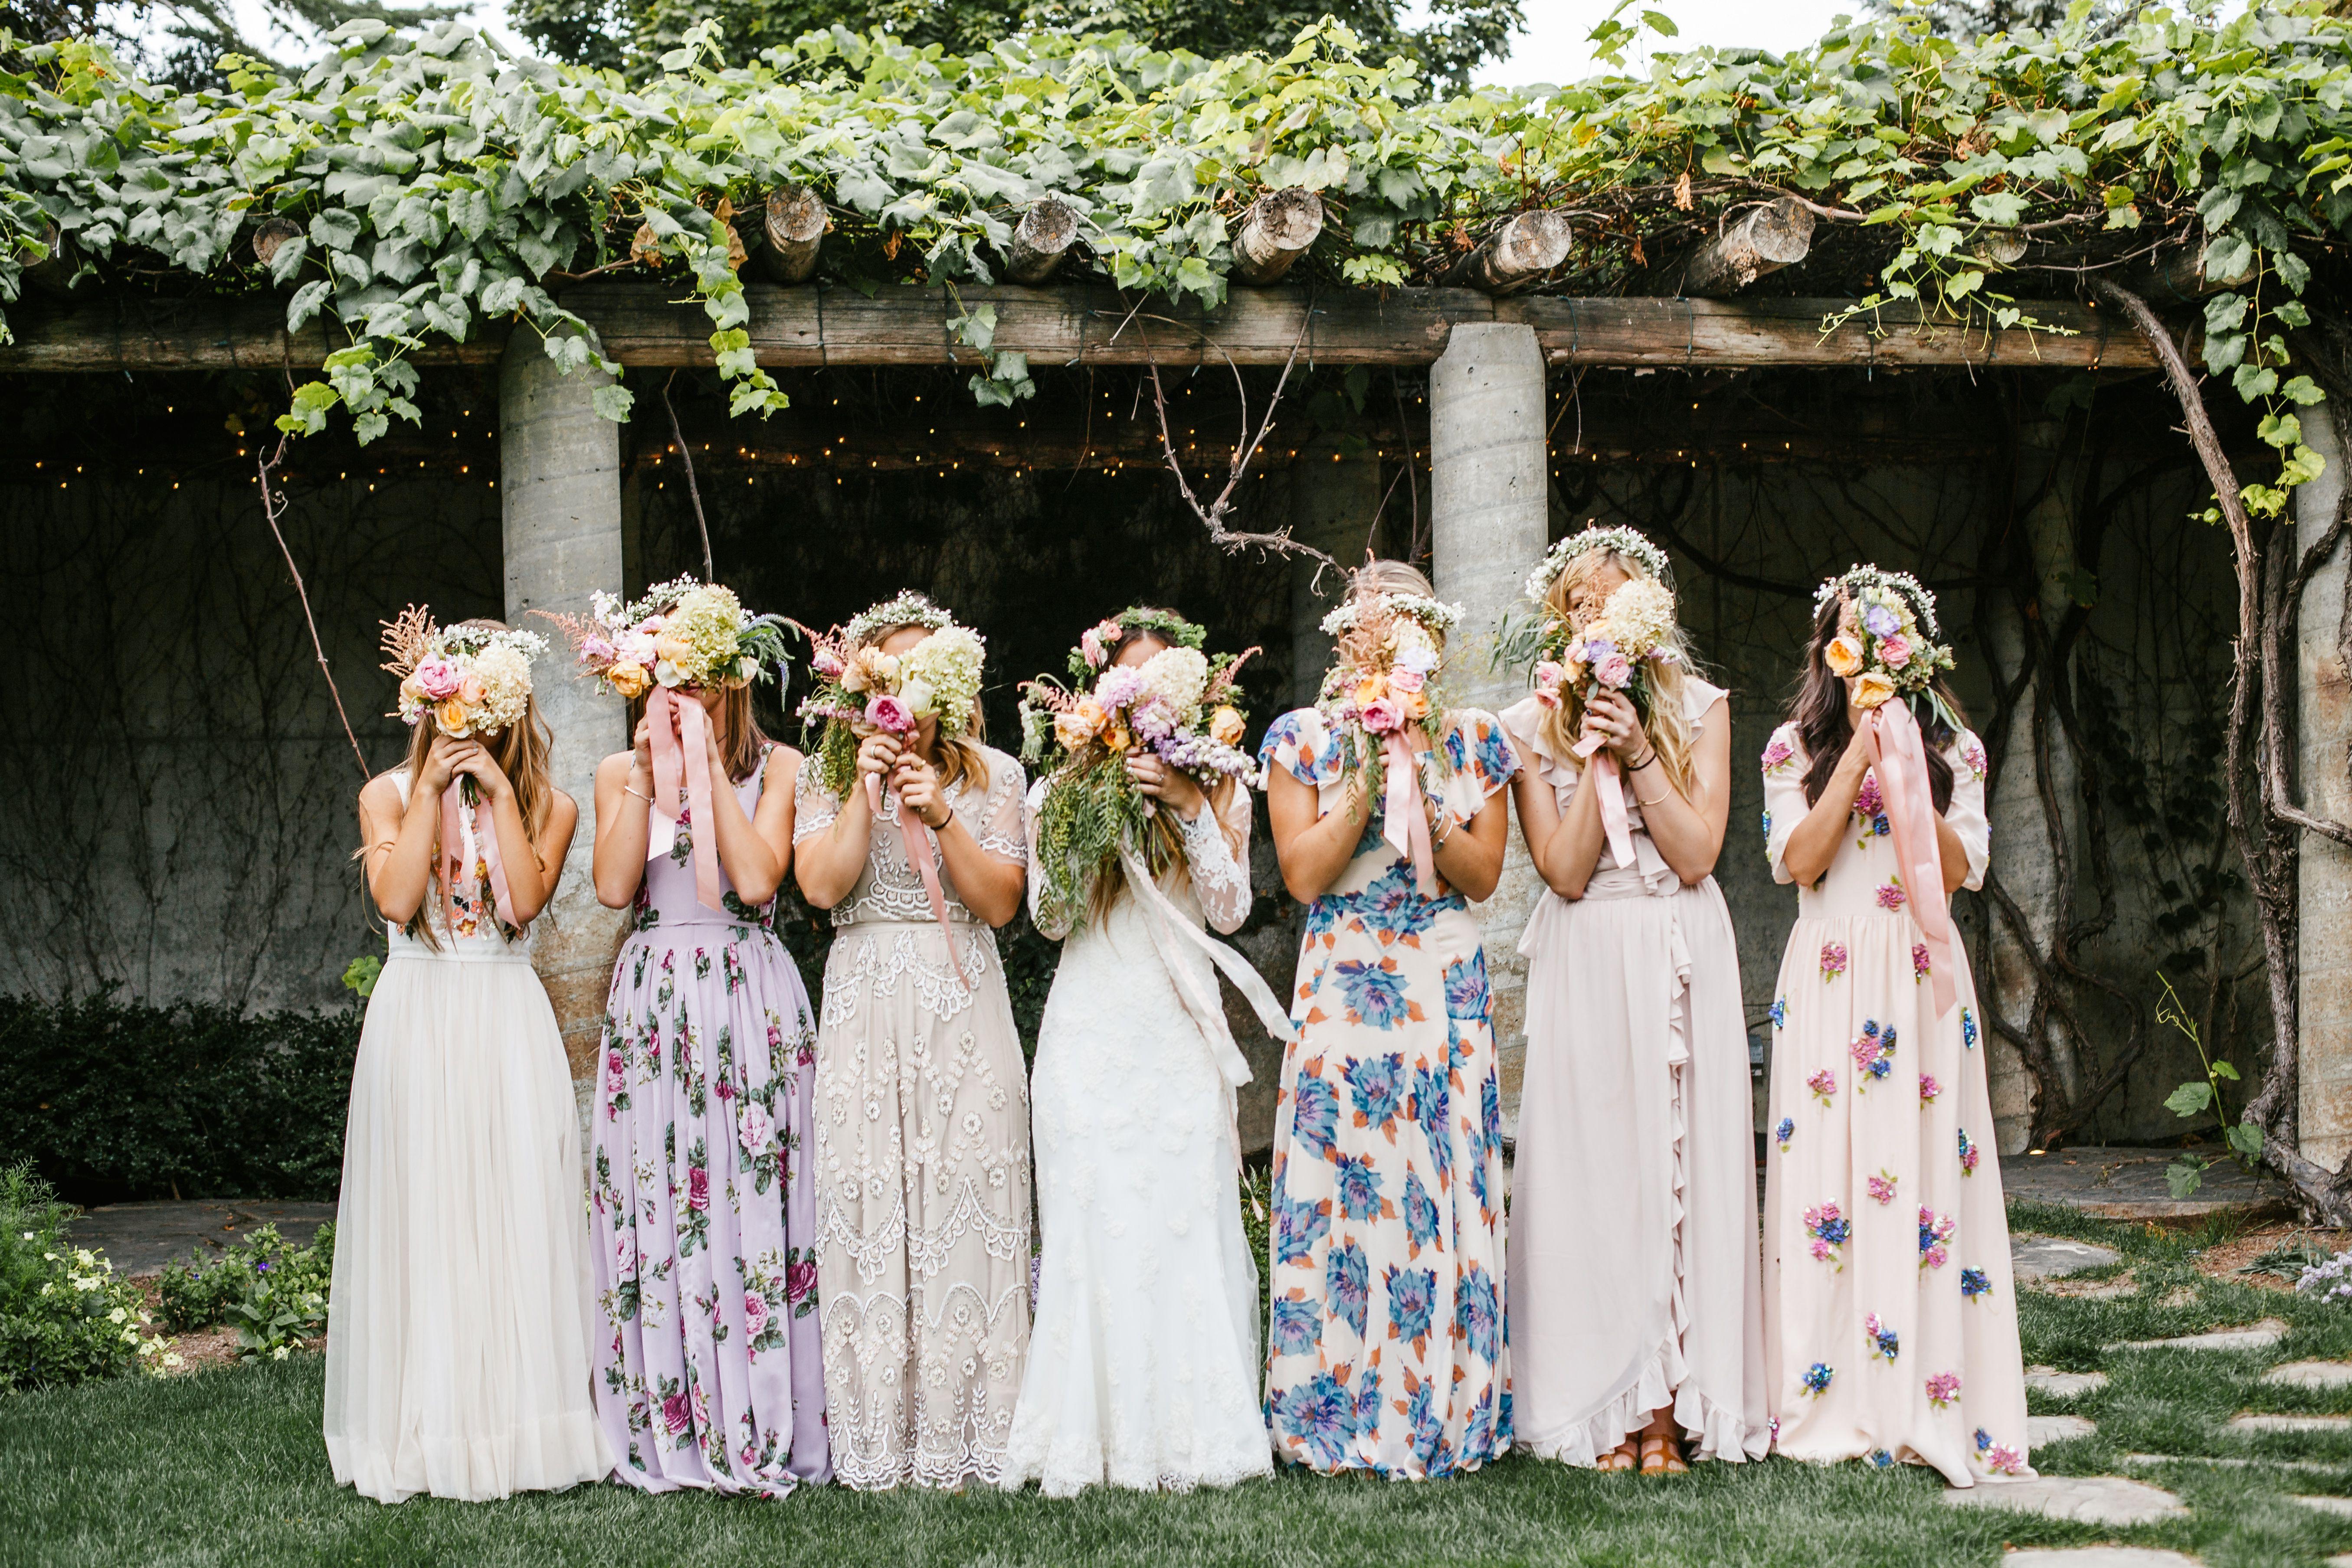 Bohemian Bride Bridesmaid Dresses Boho Bohemian Bridesmaid Patterned Bridesmaid Dresses